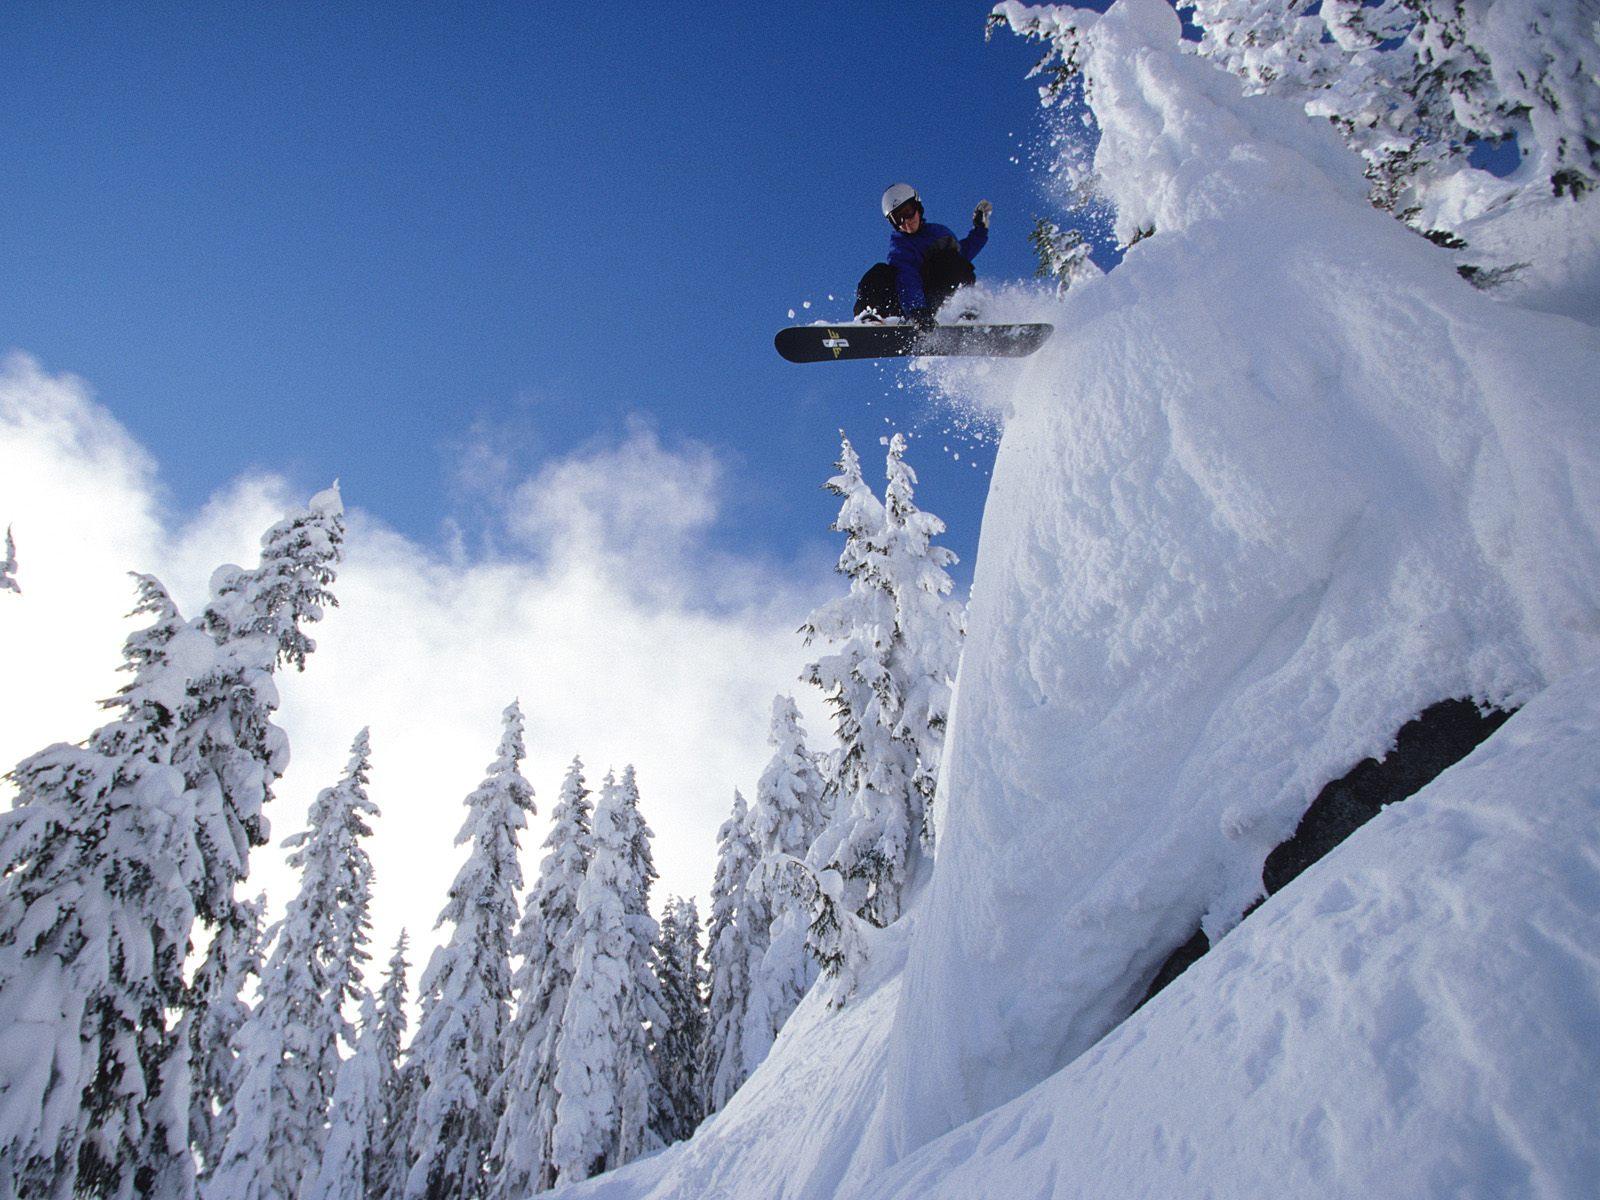 http://3.bp.blogspot.com/-ltdOqbfNZWQ/TcEv6Gb-soI/AAAAAAAAAUI/WhkUHYPeU_4/s1600/mountain_snow_1_1600x1200.jpg